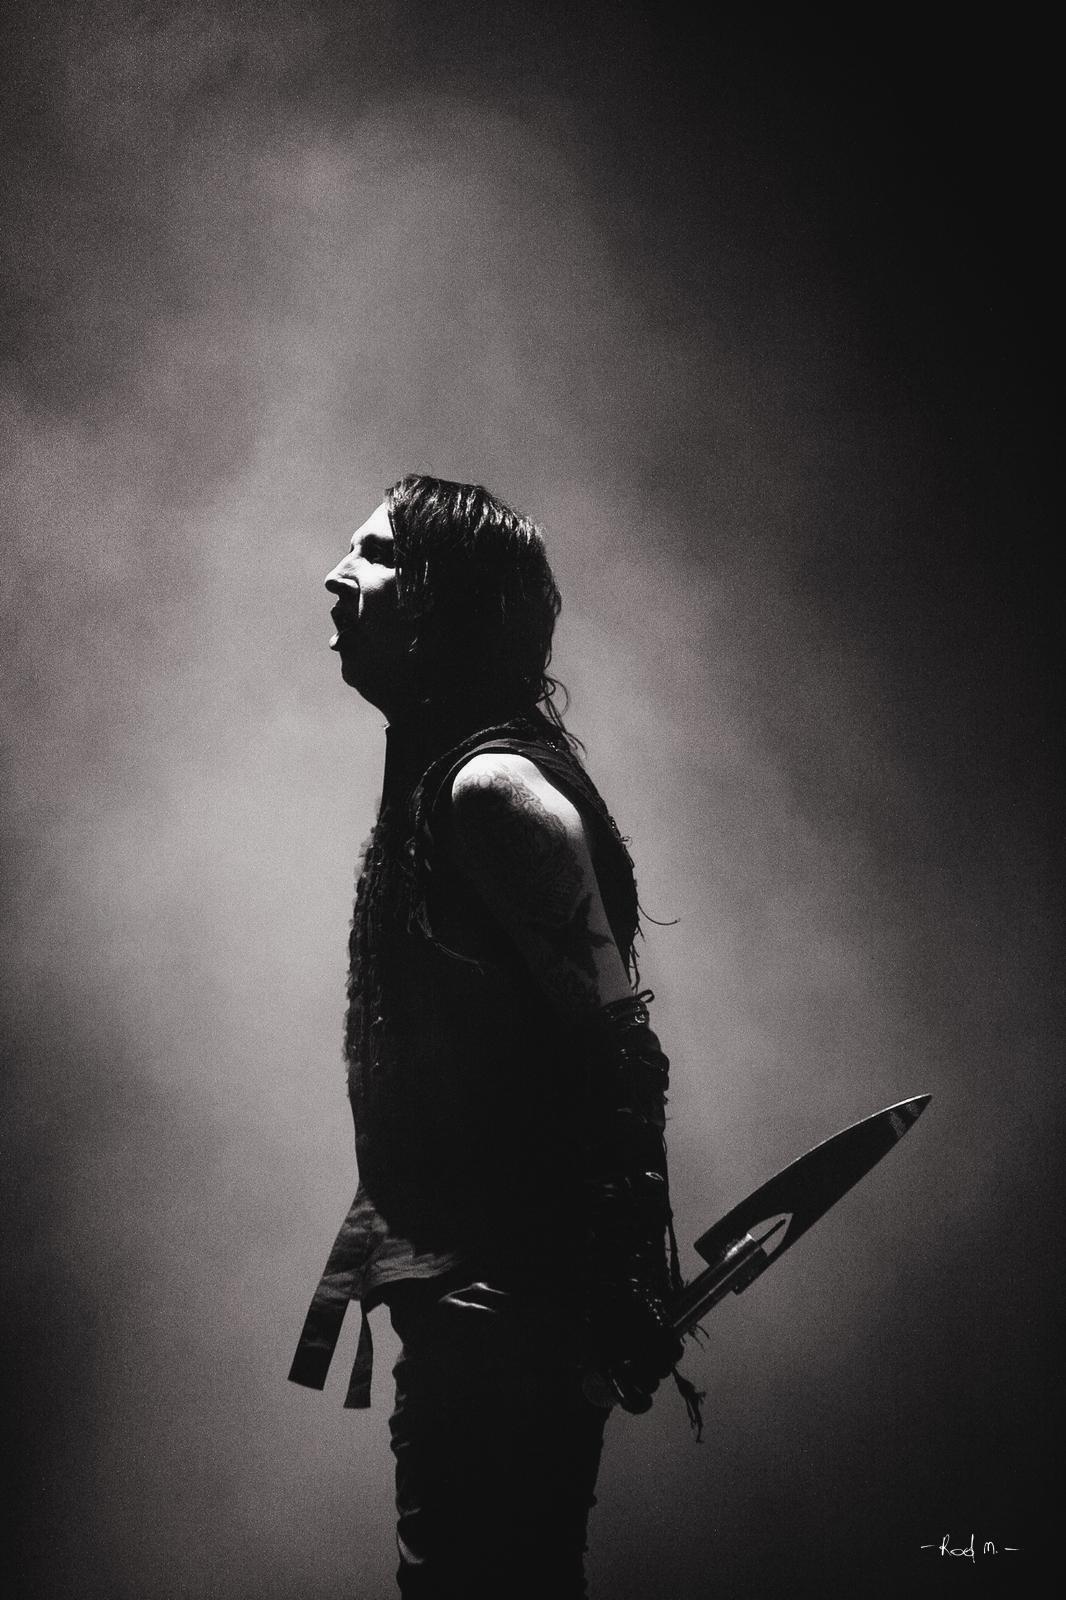 Photo Concert : Marilyn Manson - Eurockéennes, Belfort - 2007  | ©Rod Maurice